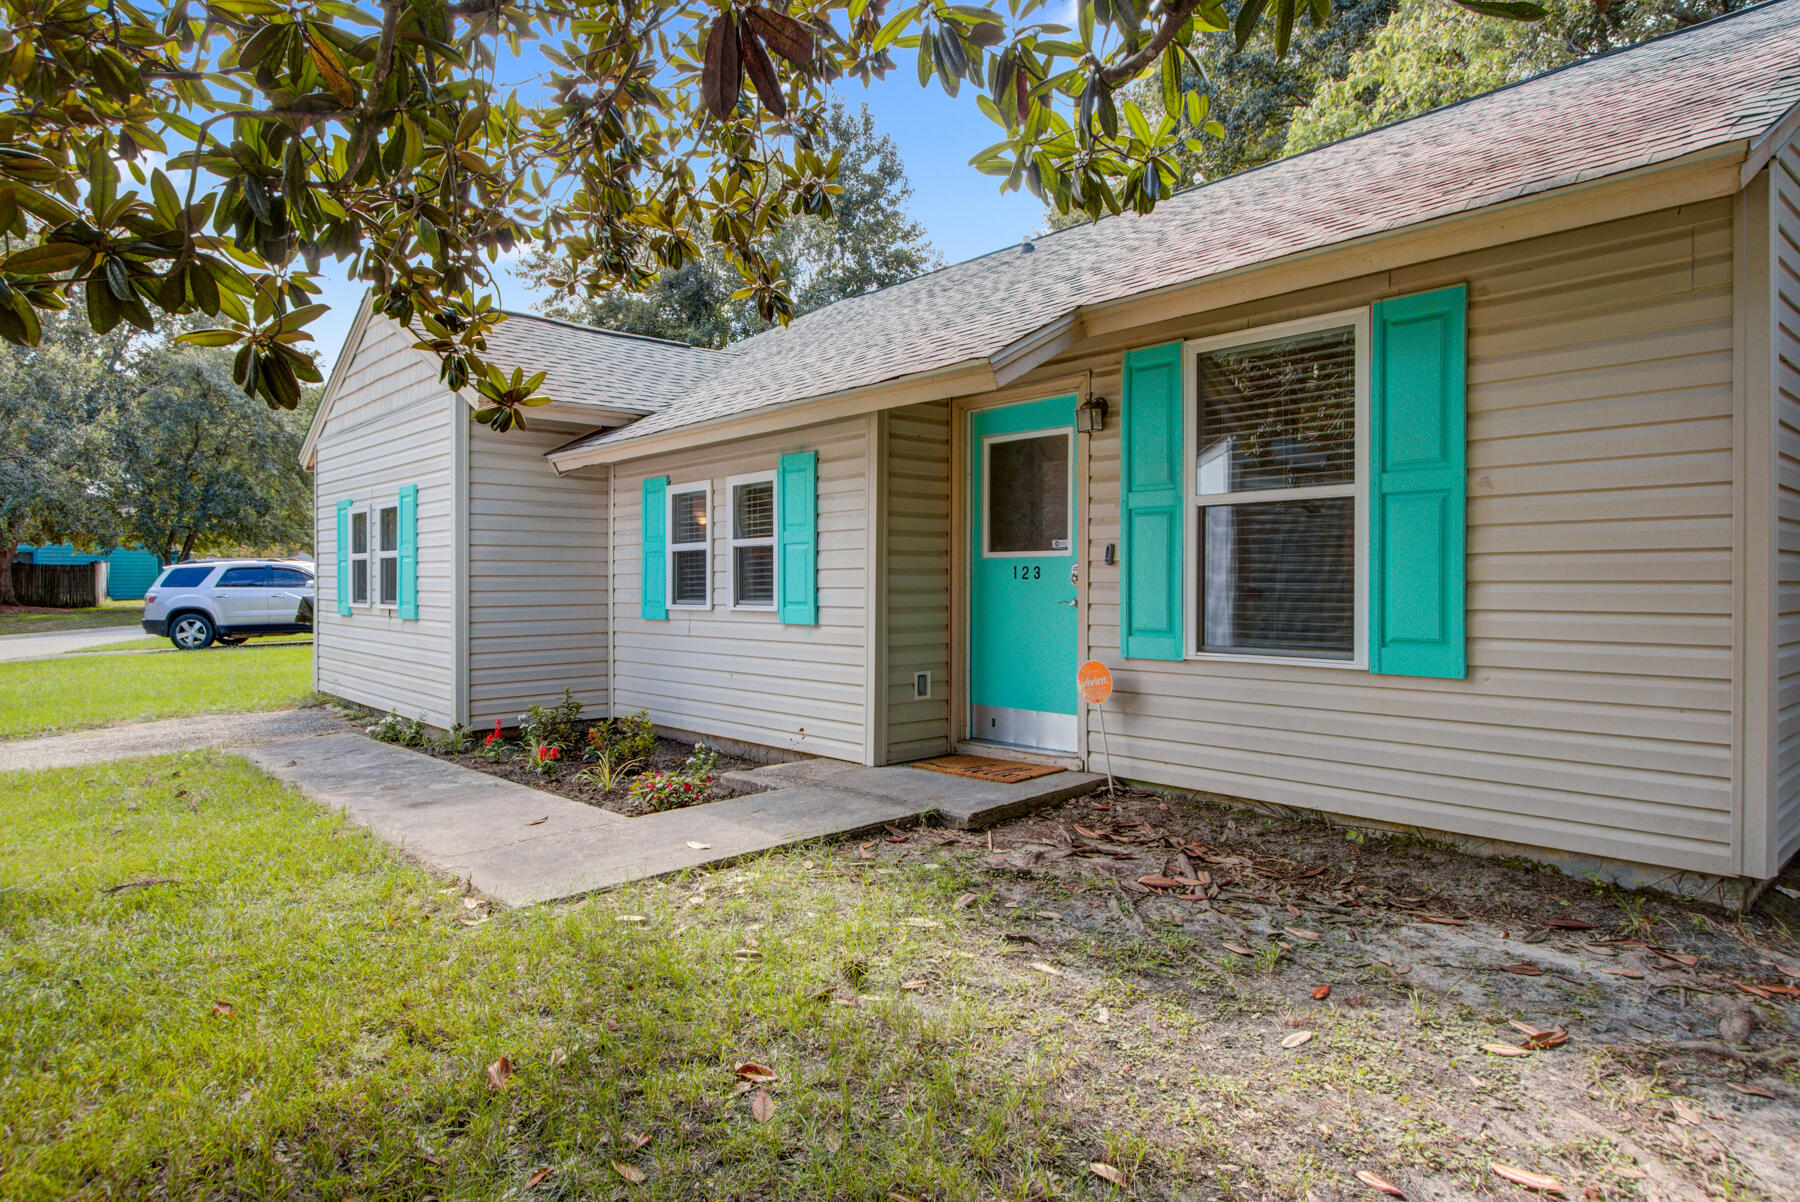 123 Tabby Creek Circle Summerville, SC 29483